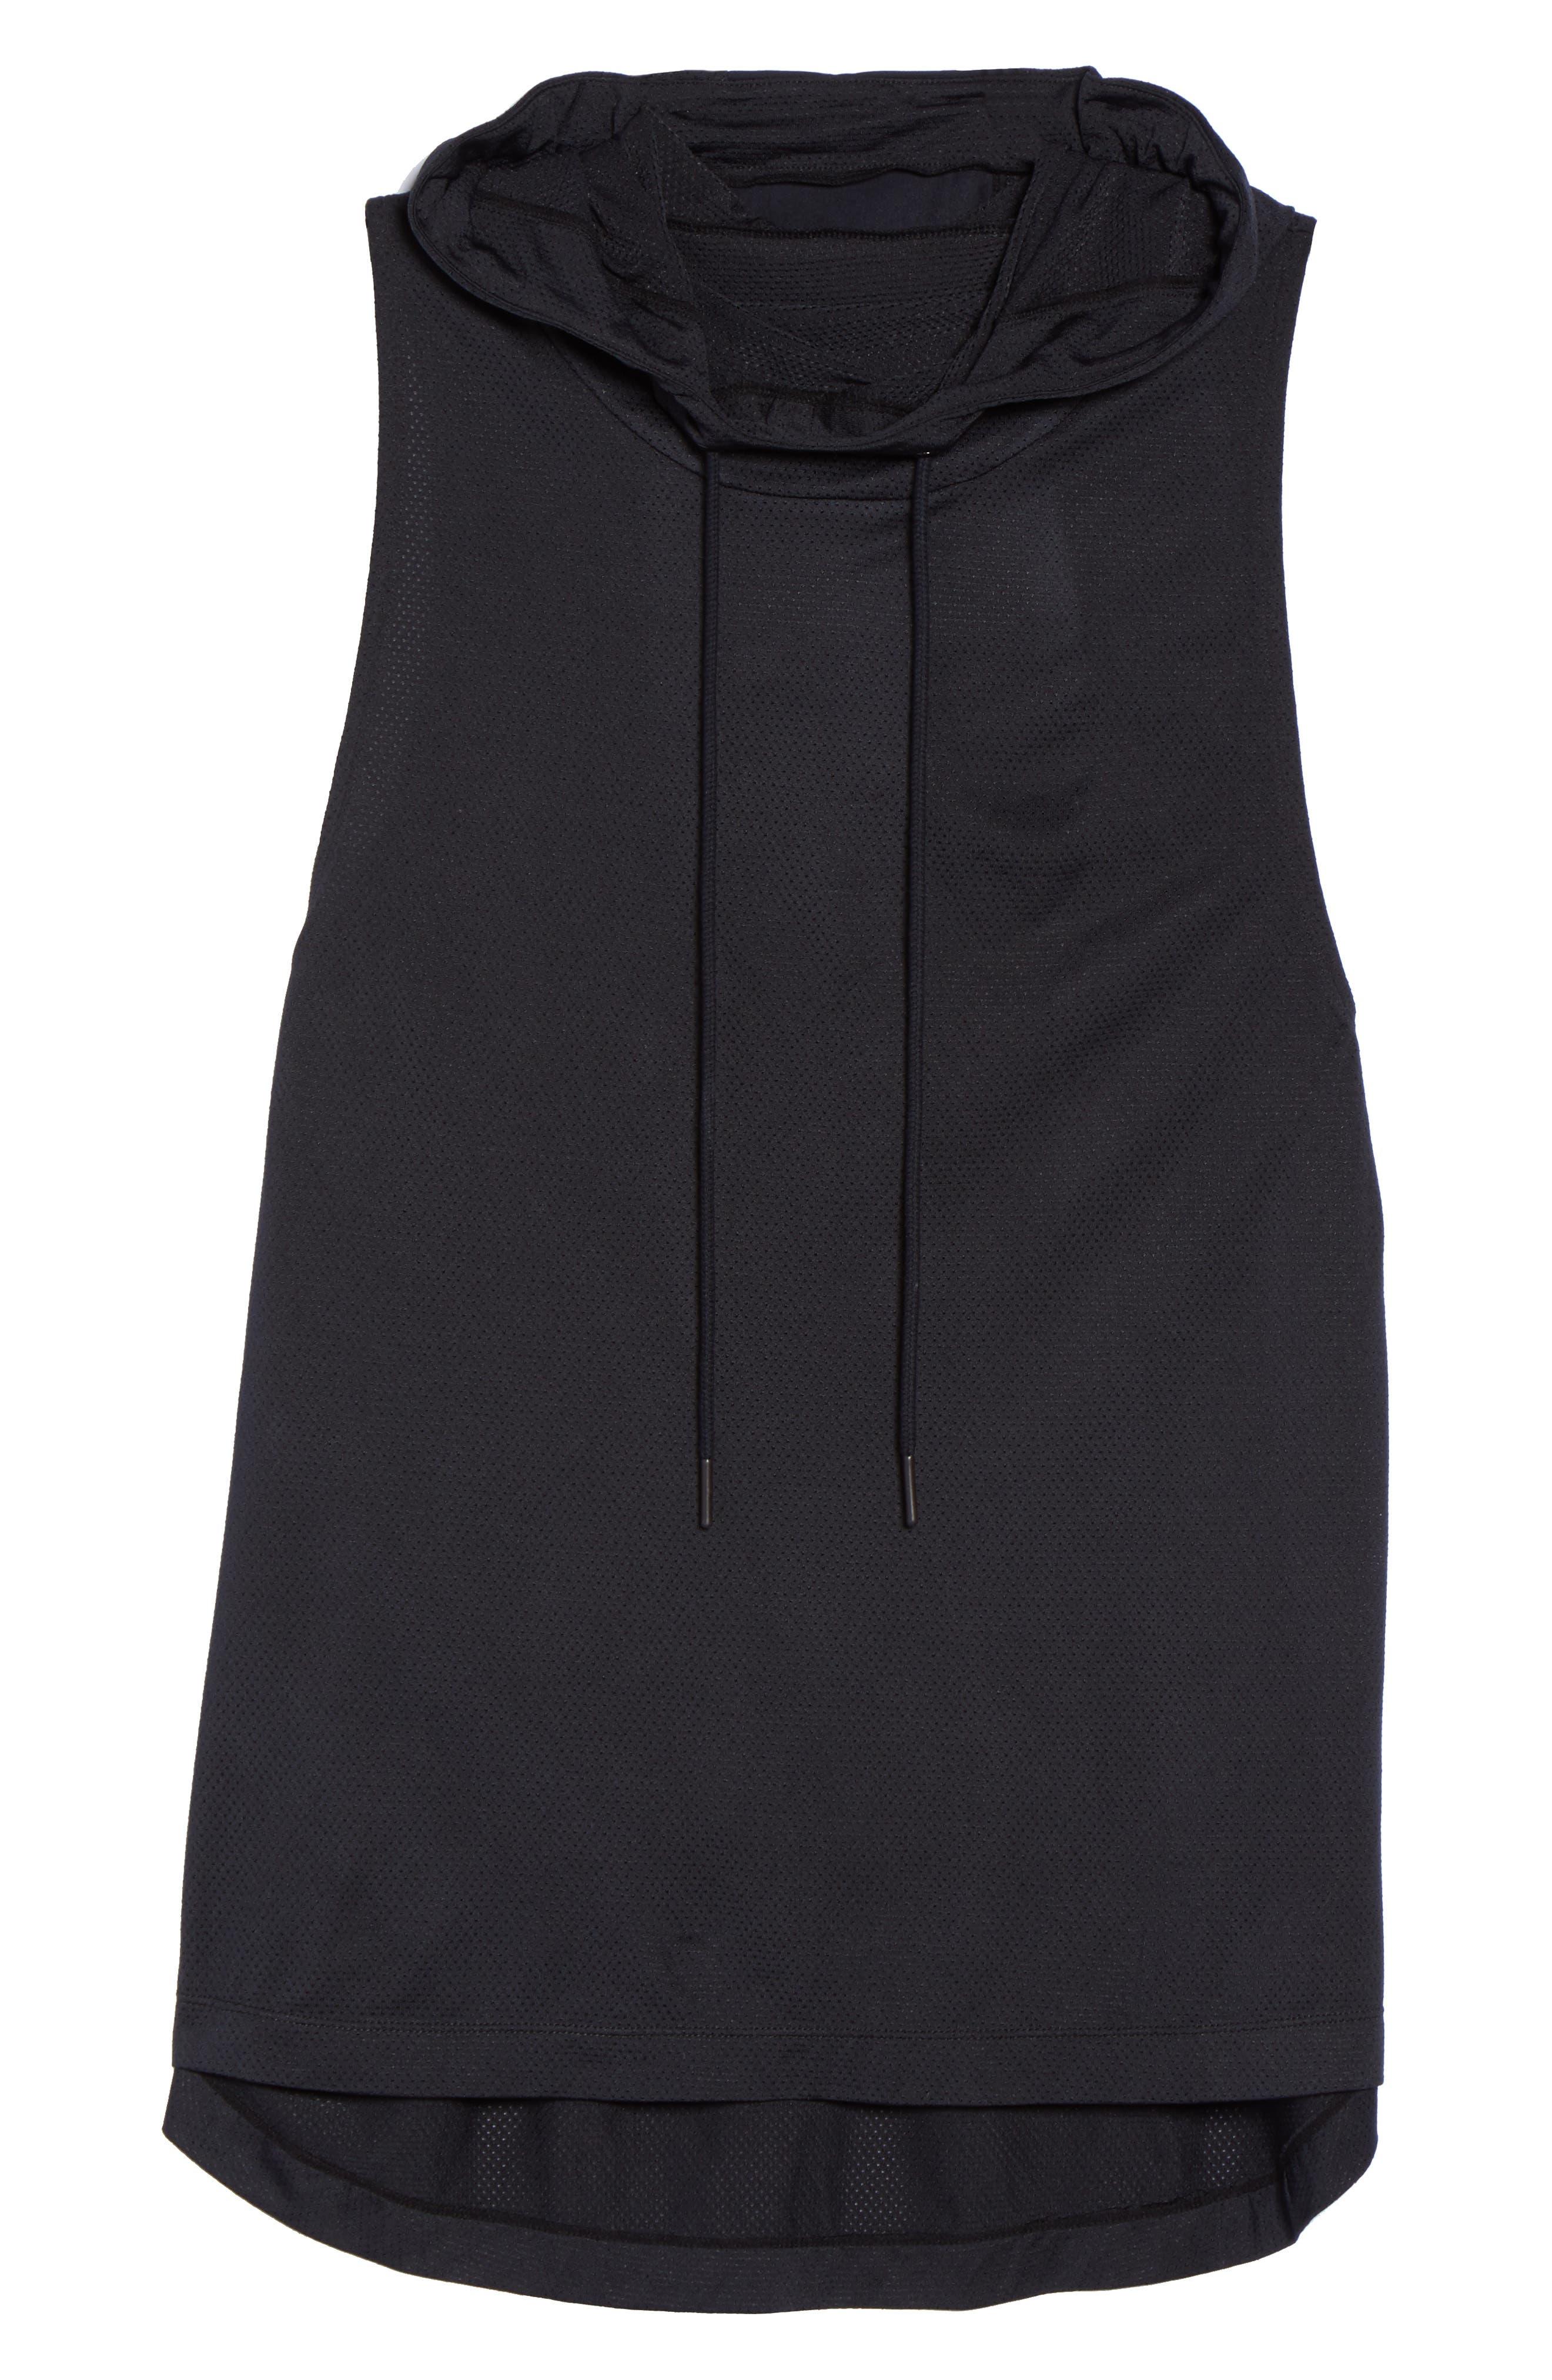 Endurance Hoodie Vest,                             Alternate thumbnail 7, color,                             Black